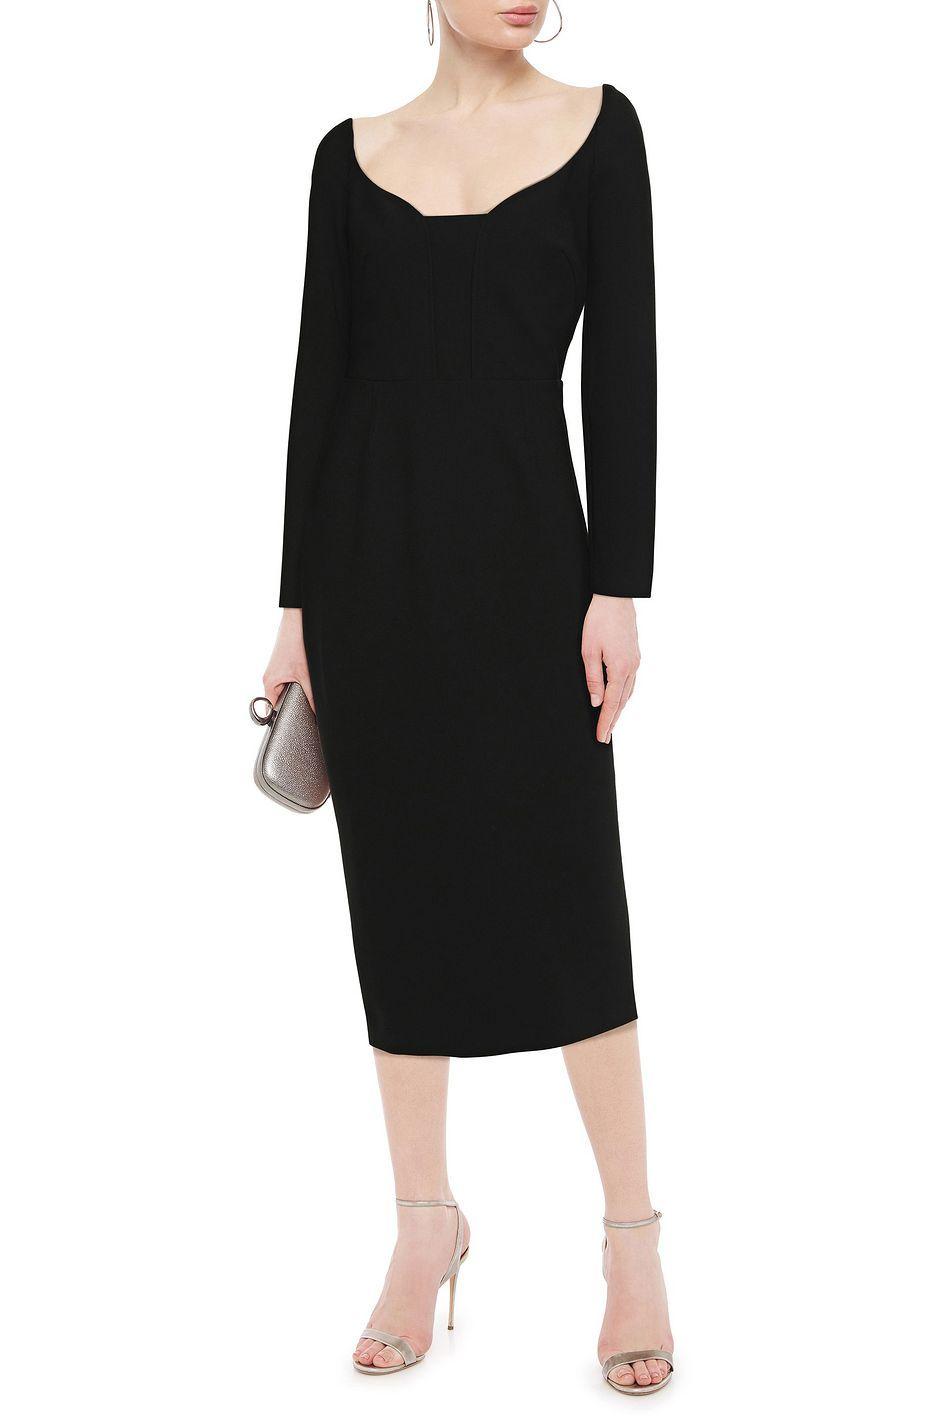 Black Ardon Stretch Crepe Midi Dress Sale Up To 70 Off The Outnet Roland Mouret Midi Dress Sale Beach Wear Outfits Beachwear Fashion [ 1425 x 950 Pixel ]